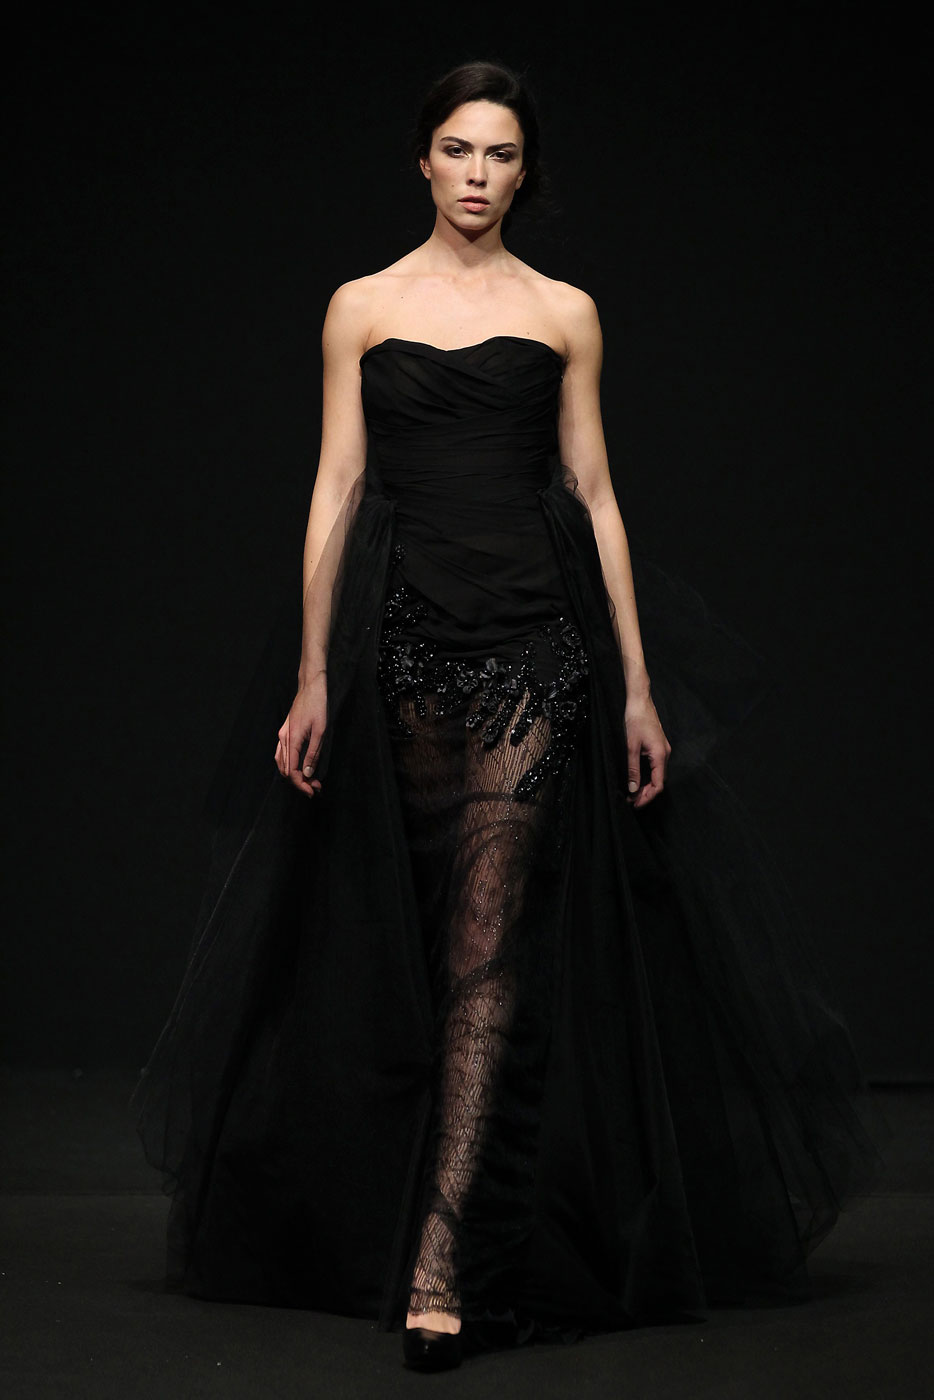 Abed-Mahfouz-fashion-runway-show-haute-couture-paris-spring-2015-the-impression-38